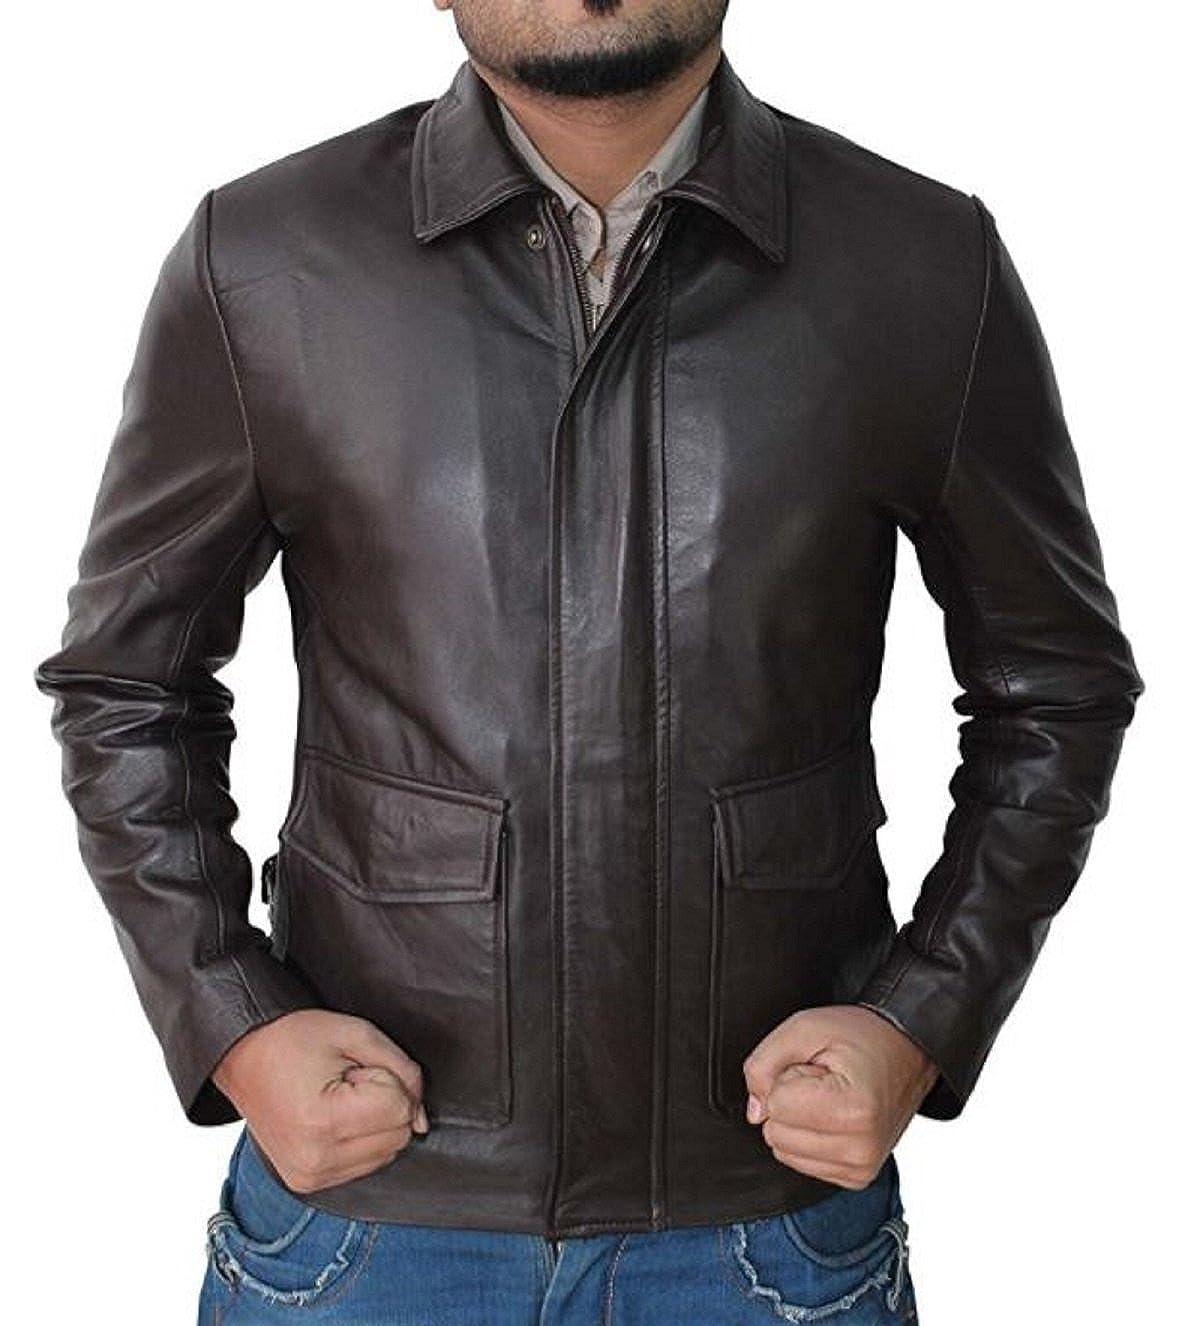 NBENTERPRISES NB Leather Mens Indiana Jones Leather Brown Jacket NBE-11019